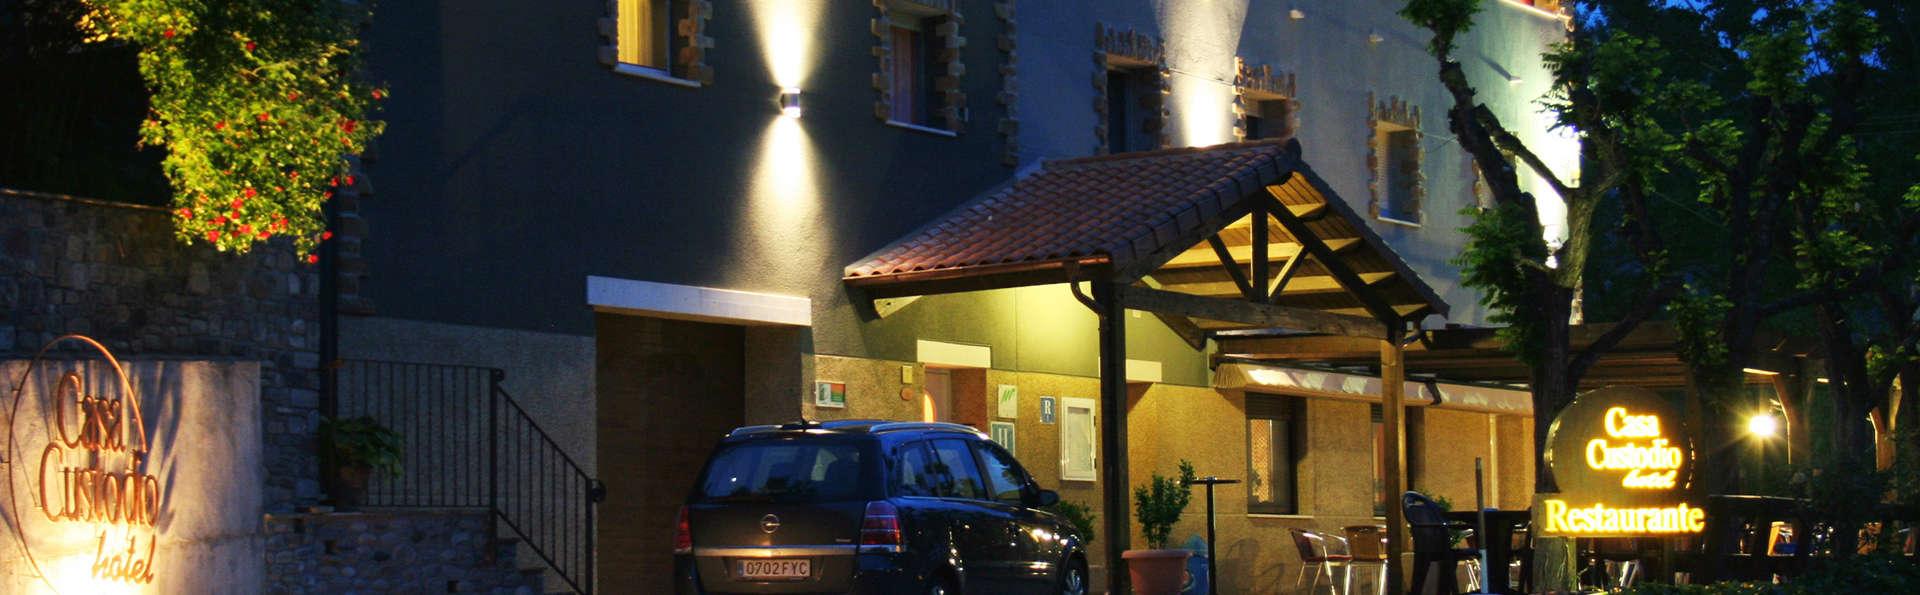 Hotel Casa Custodio - EDIT_front1.jpg